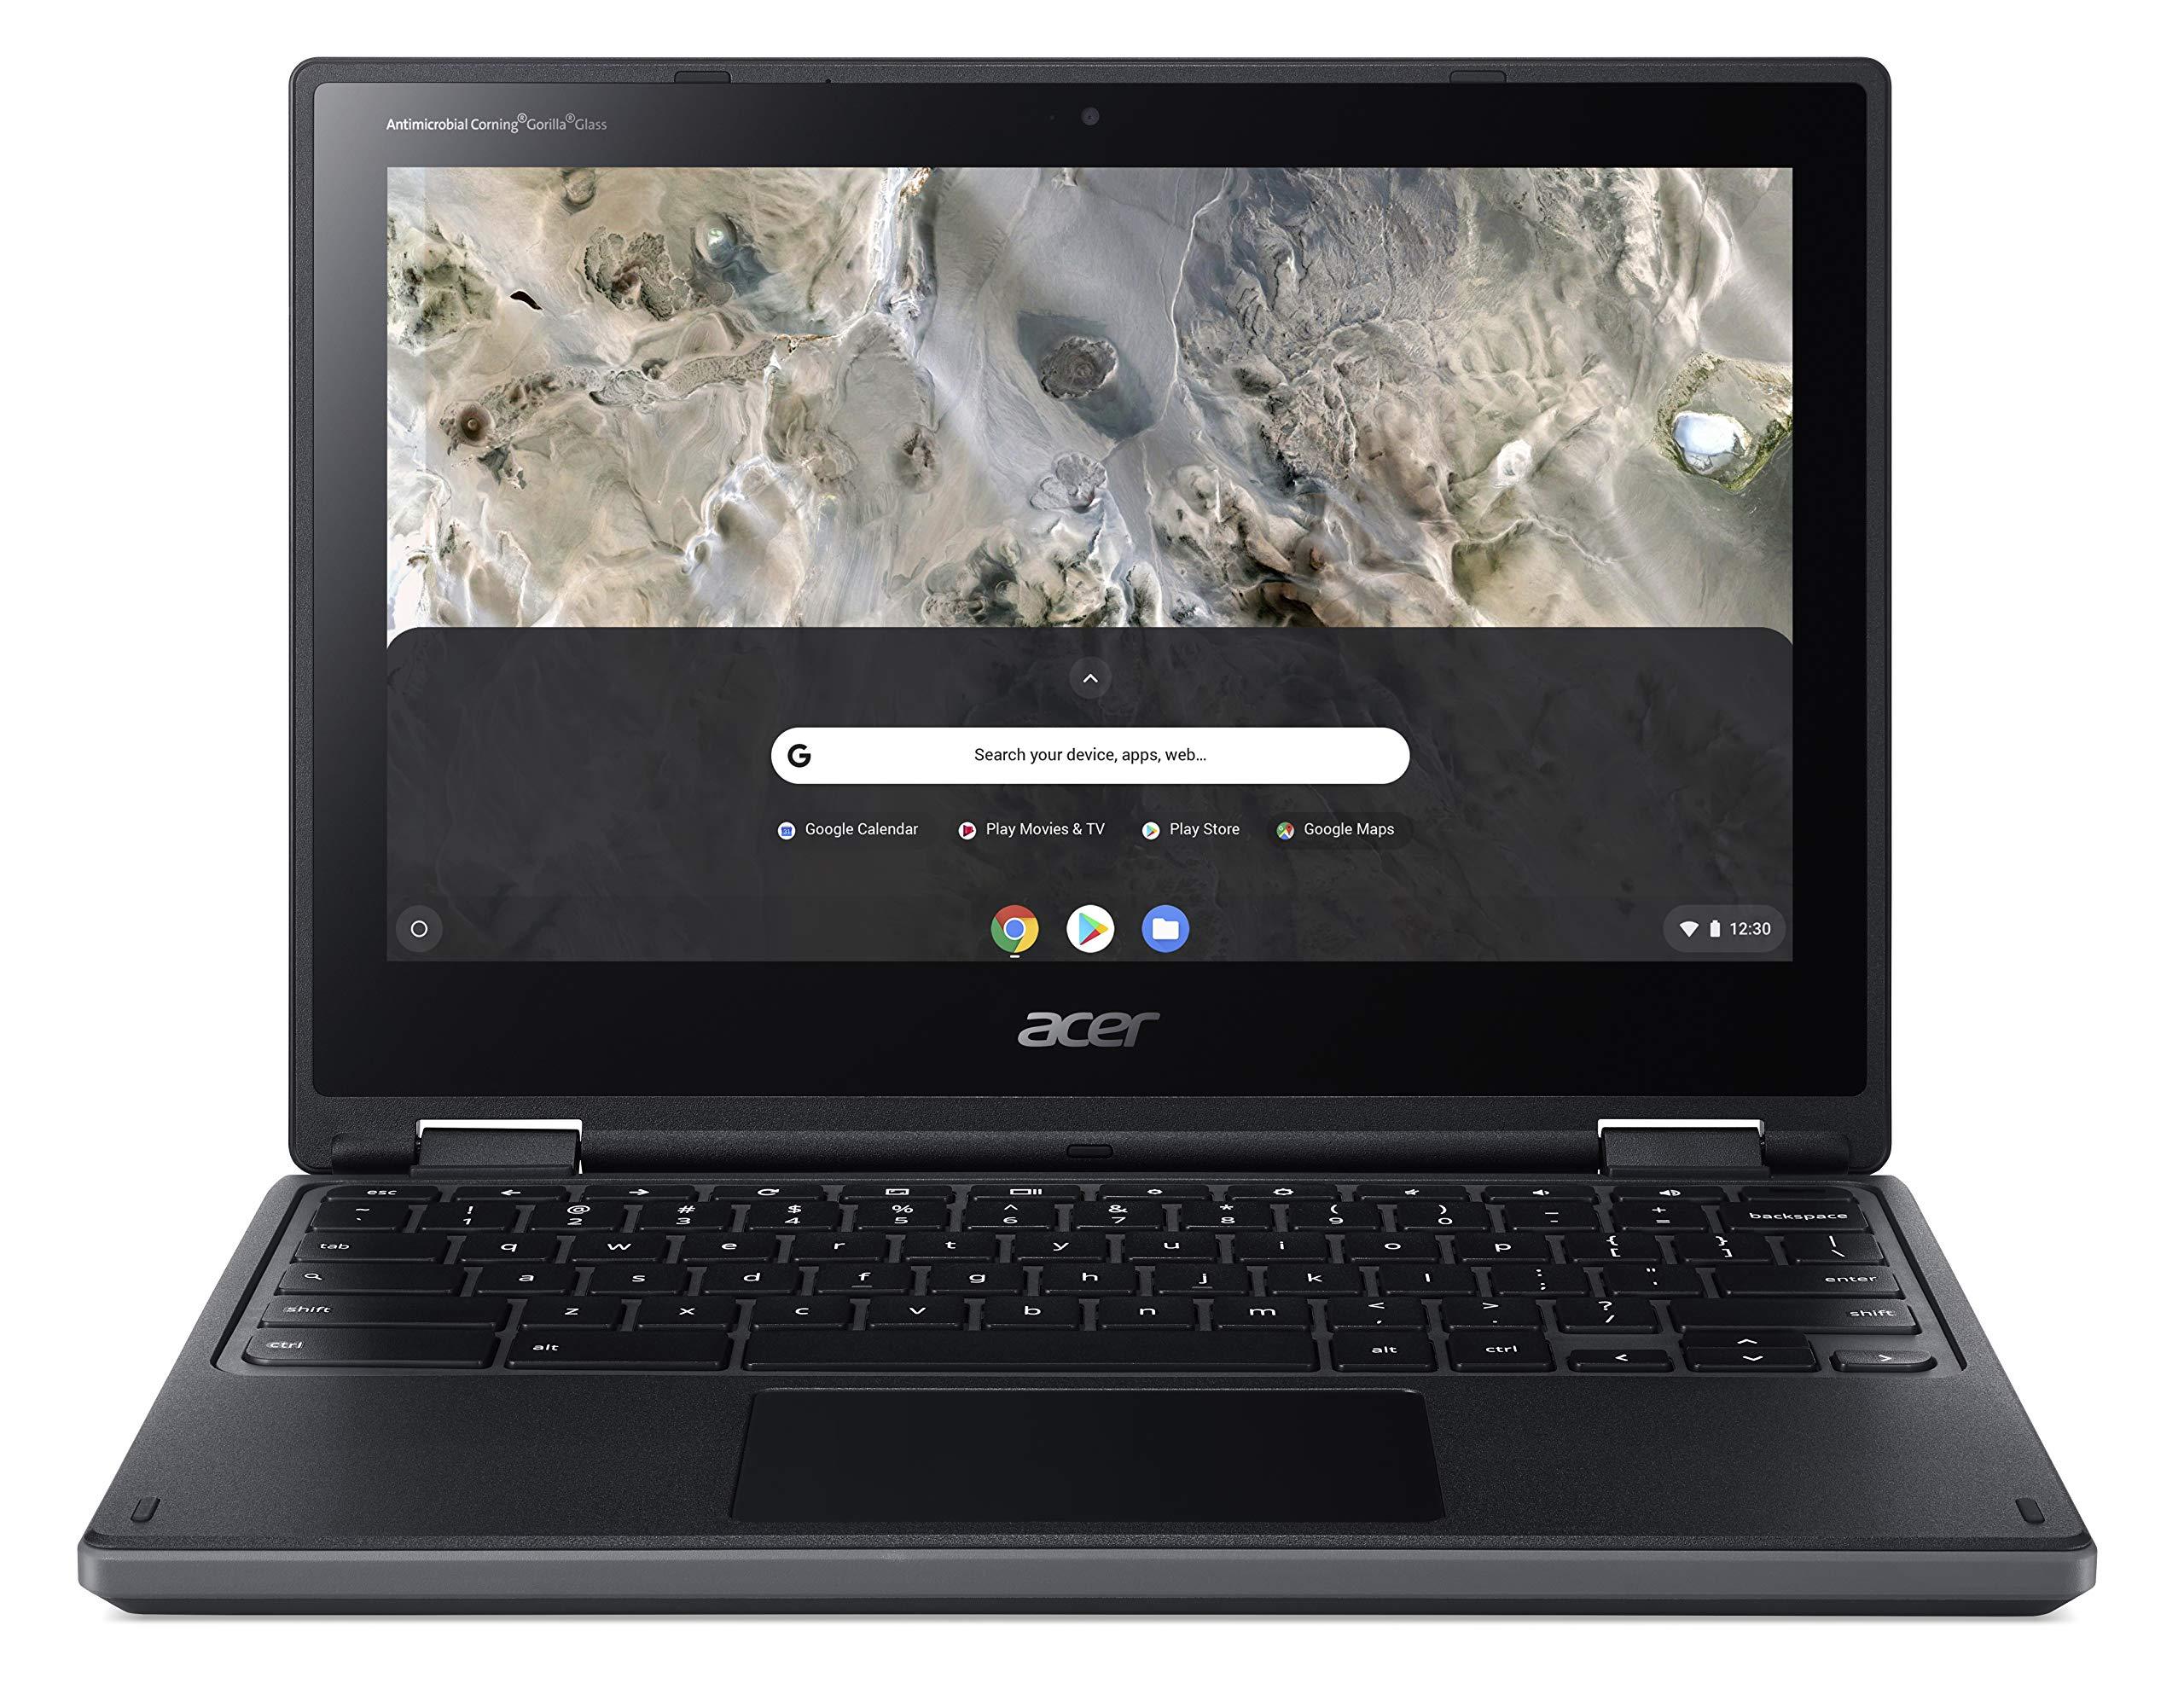 Acer Chromebook Spin 311 R721t Amd A4 Buy Online In Andorra At Desertcart